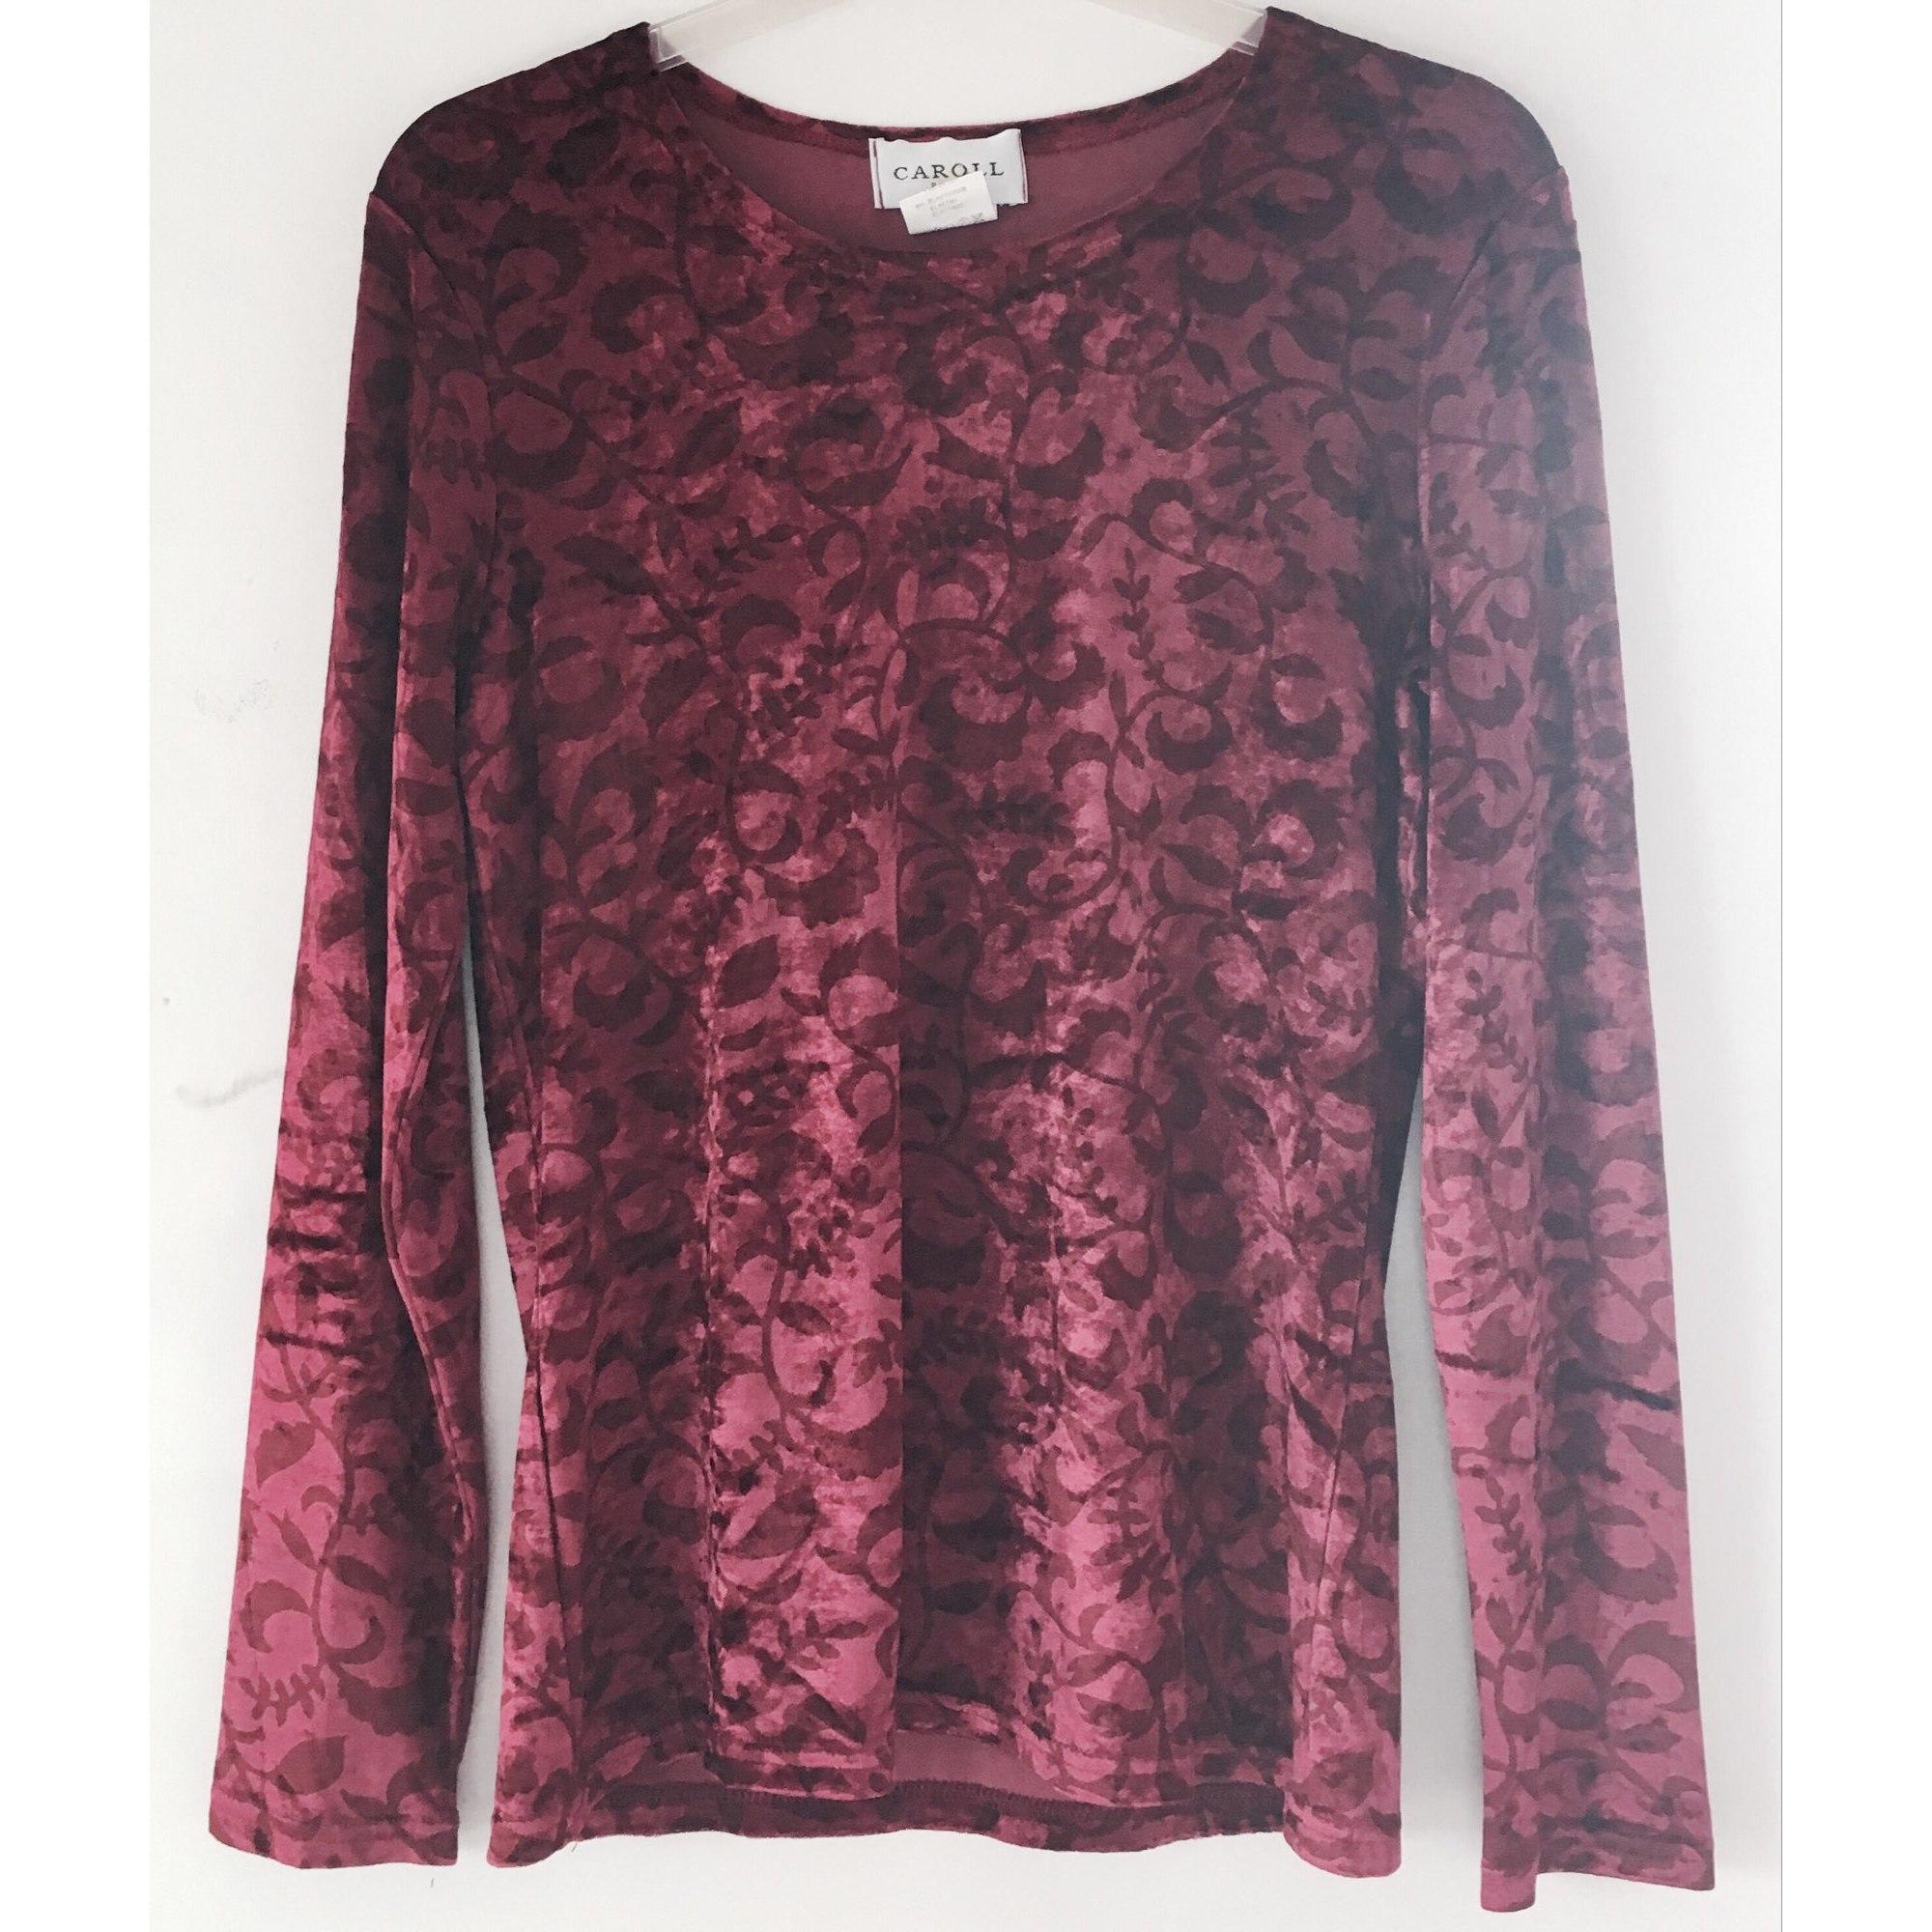 Top, tee-shirt CAROLL Rouge, bordeaux